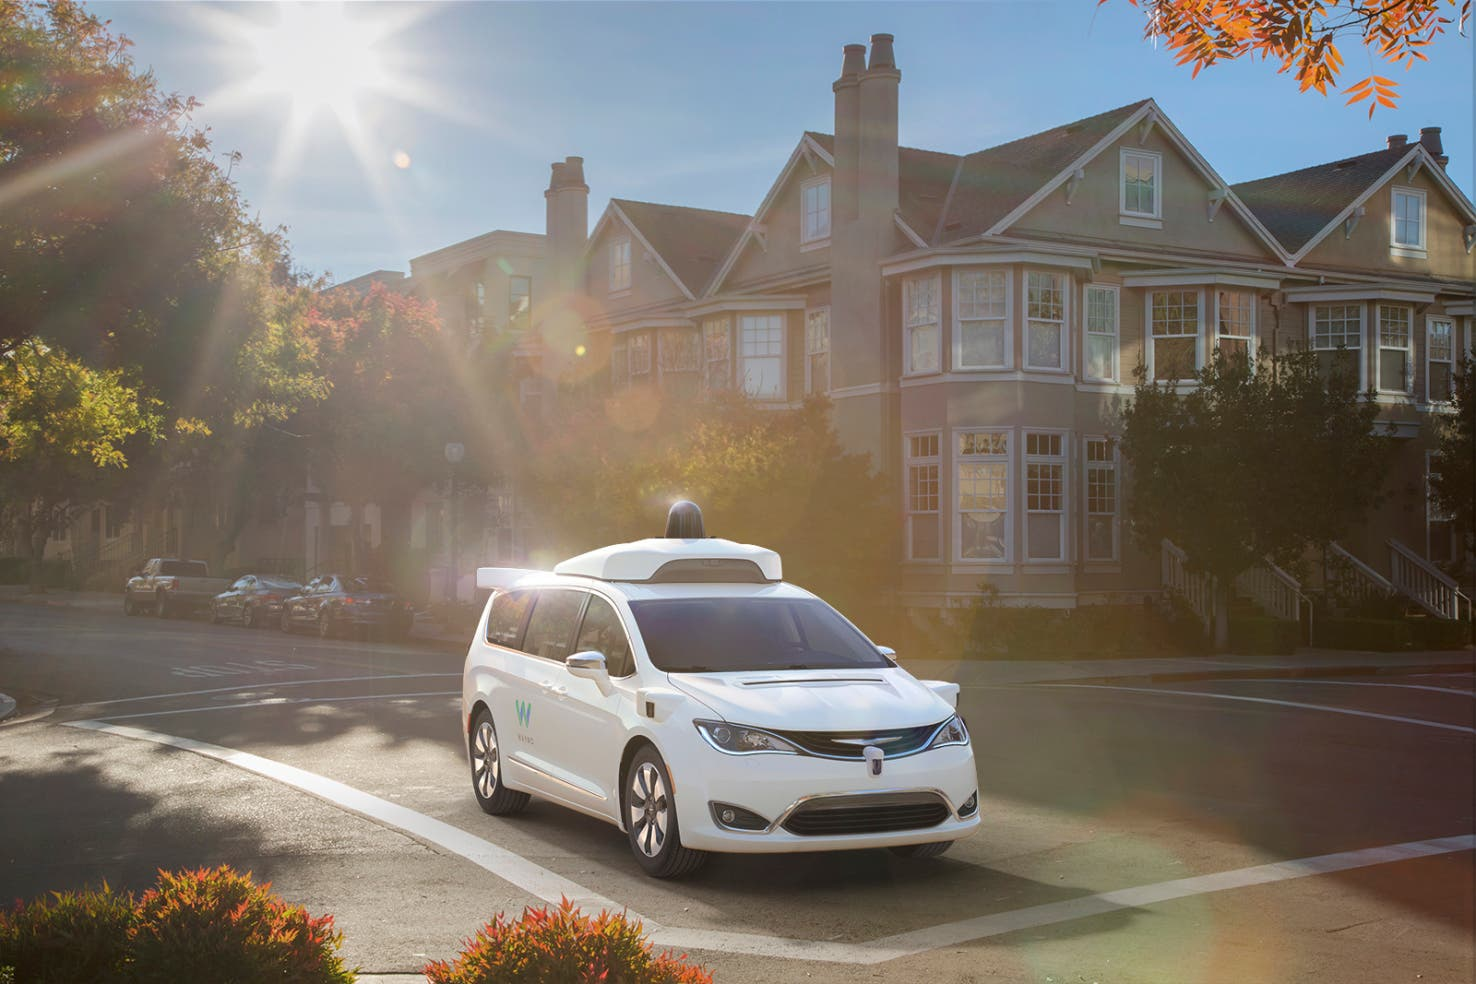 Waymo Agrees To Purchase Thousands More Autonomous Chrysler Pacifica Hybrid Minivans